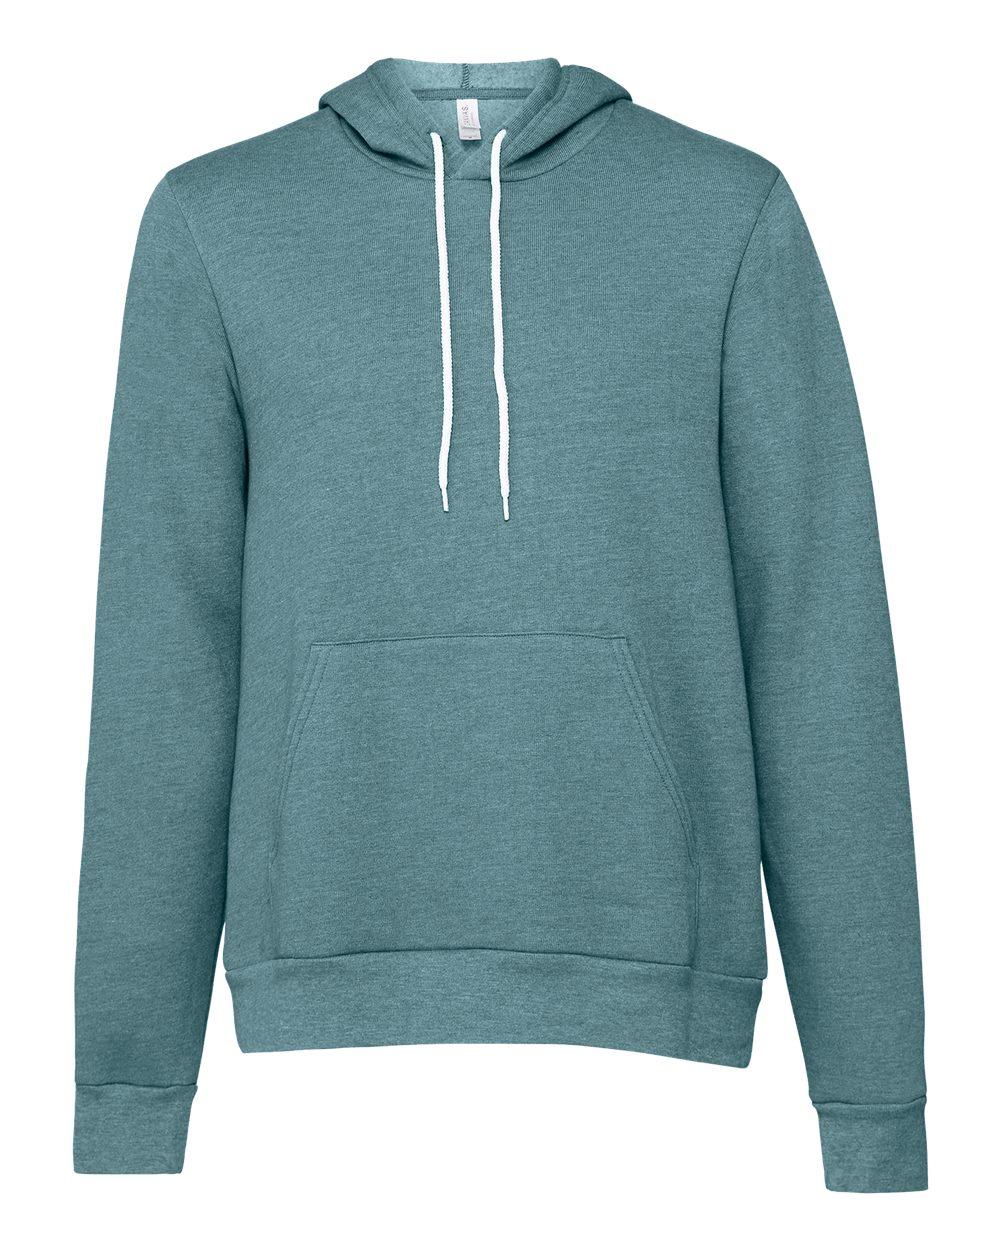 Bella-Canvas-Unisex-Sponge-Hooded-Pullover-Sweatshirt-Blank-3719-up-to-2XL thumbnail 41